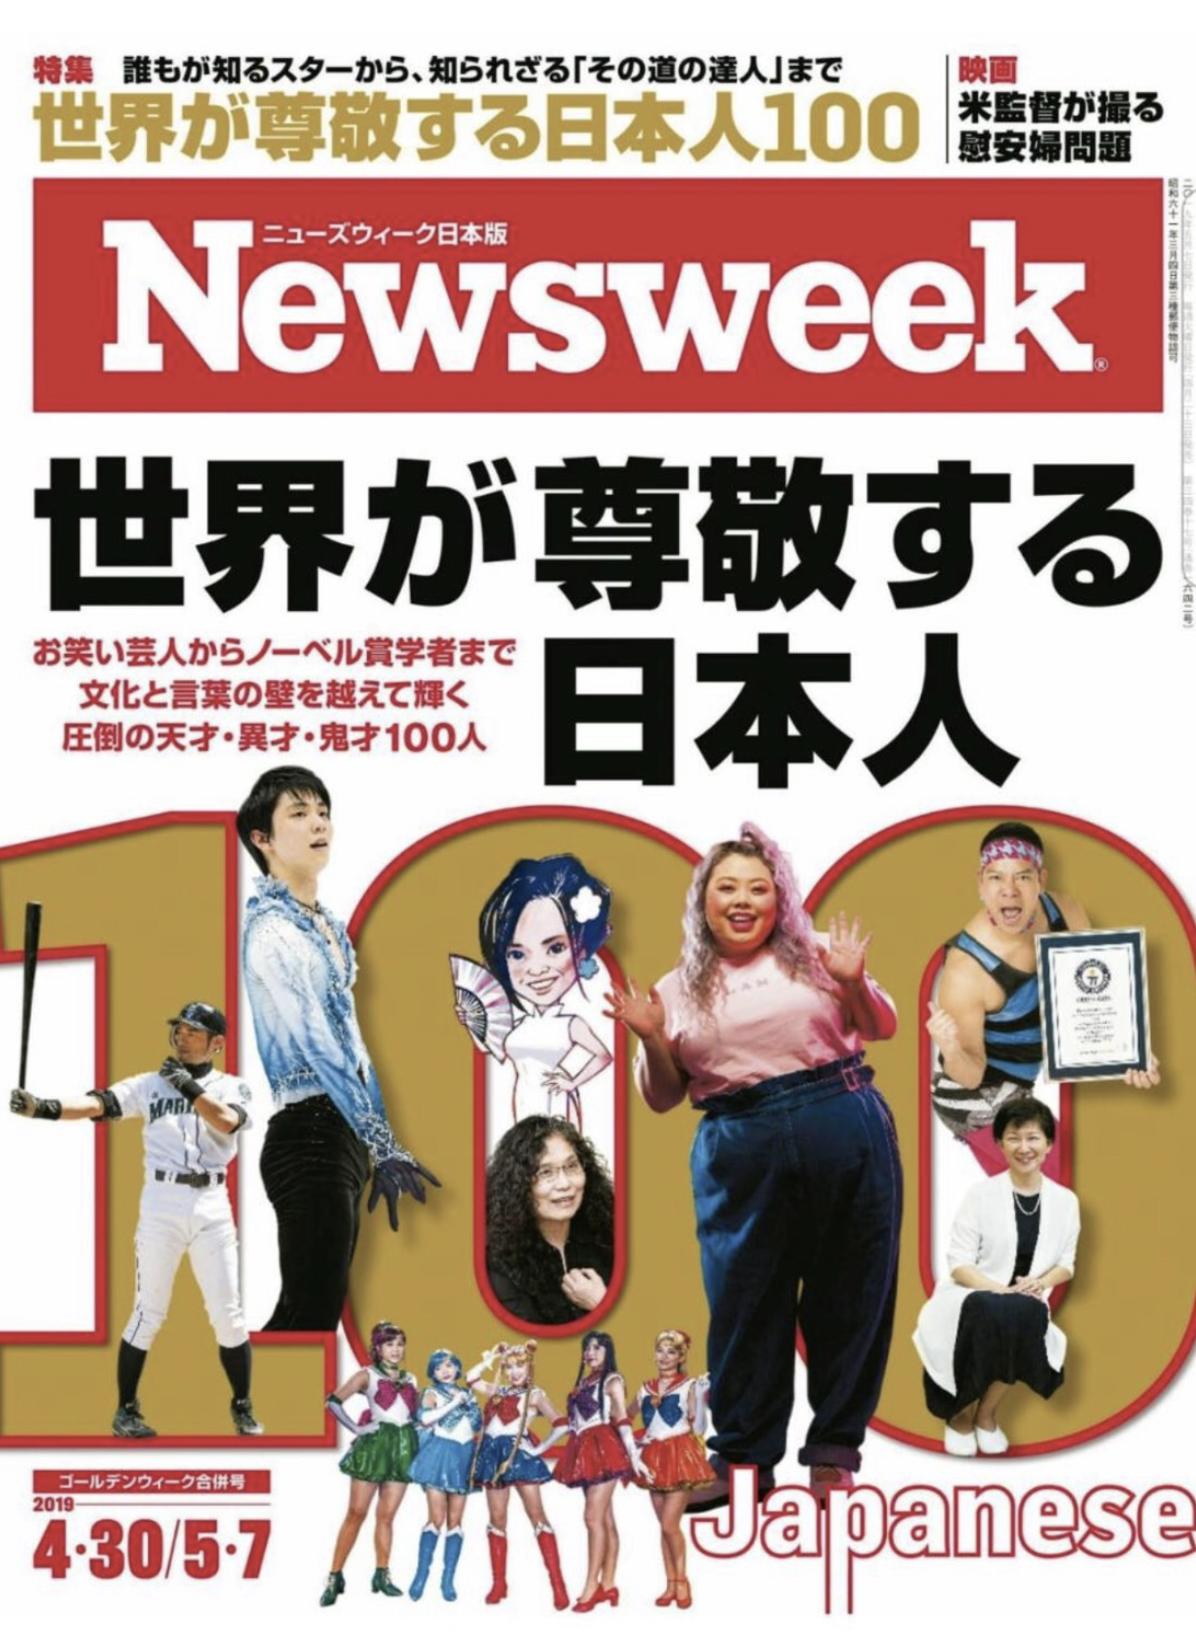 『NEWSWEEK』2019年4月30日・5月7日 合併号